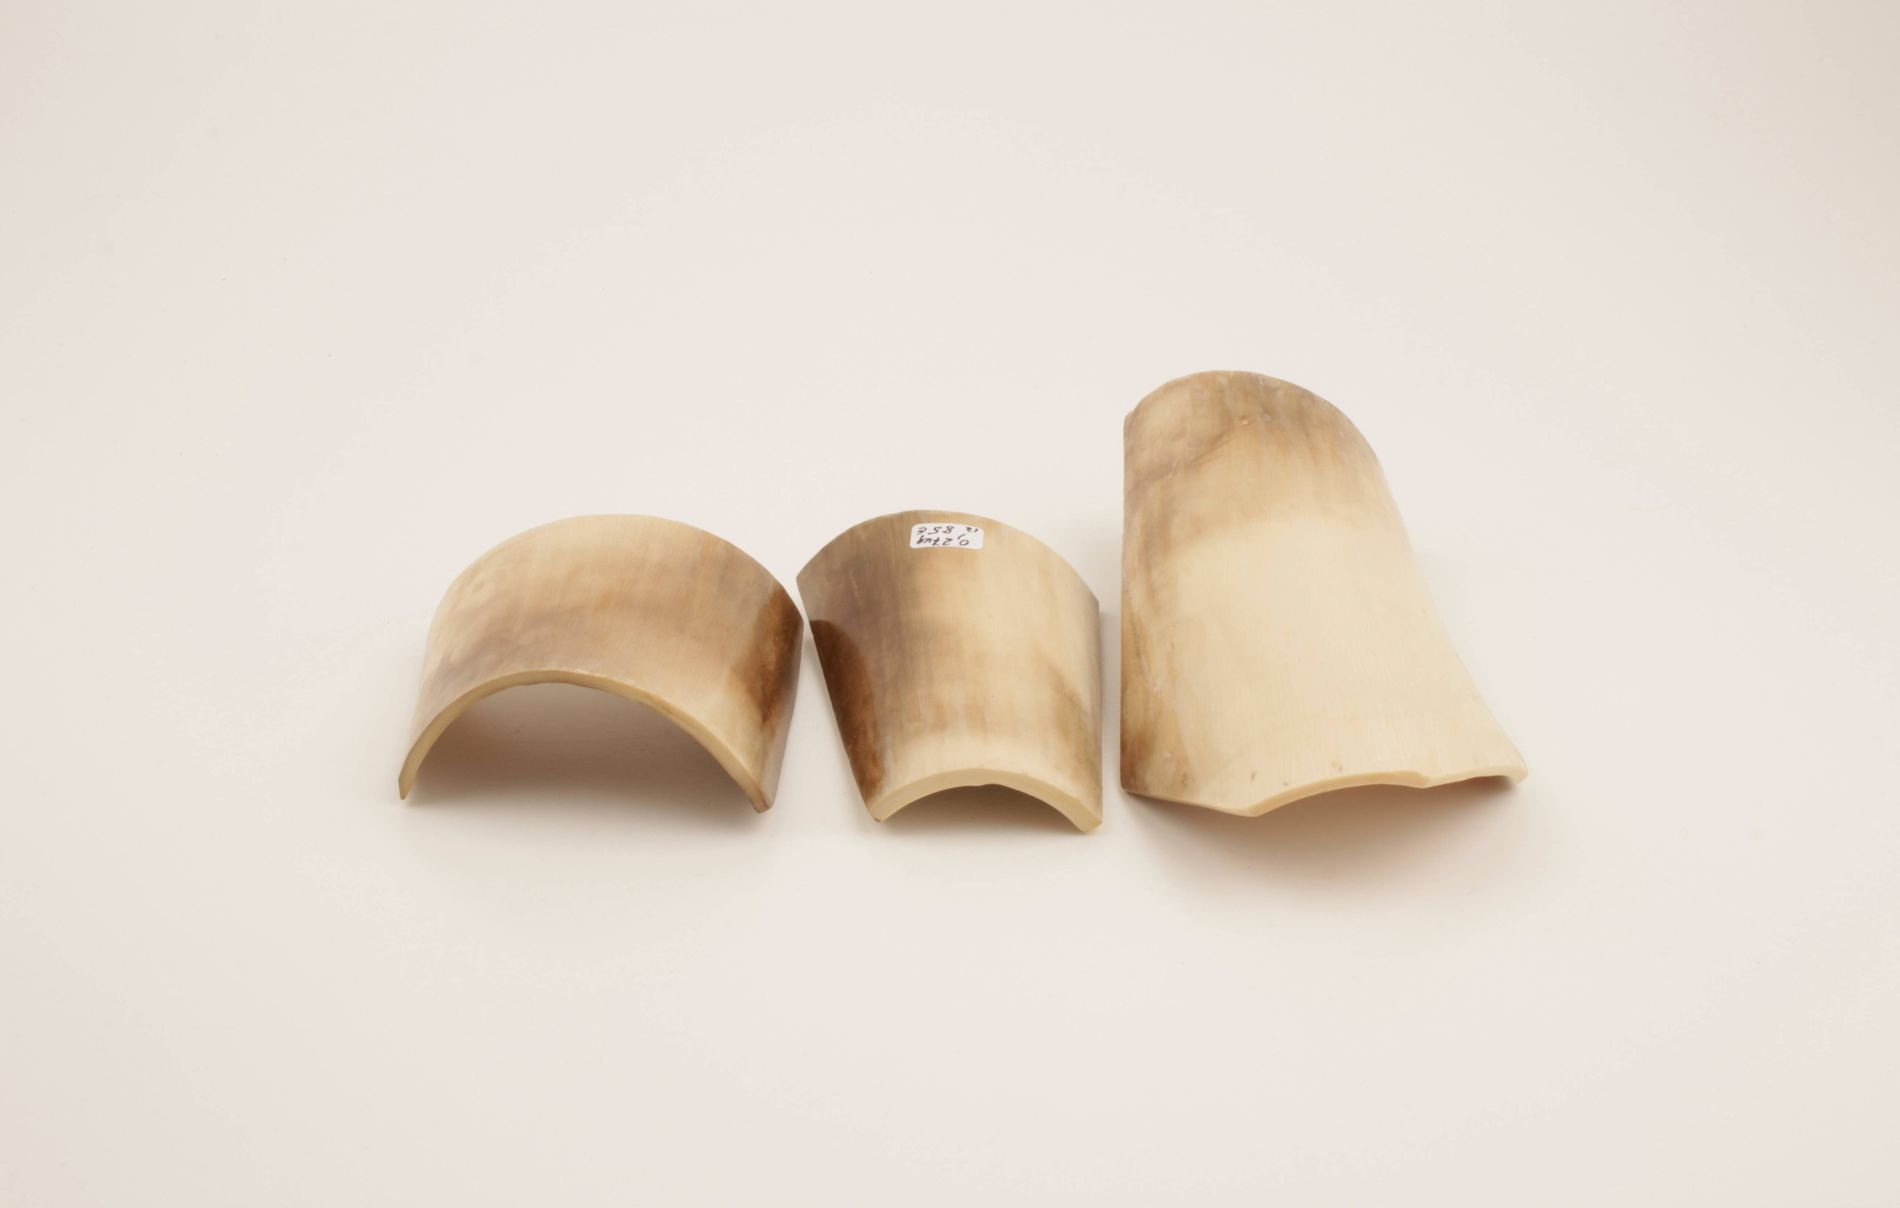 Beige-white mammoth ivory pieces